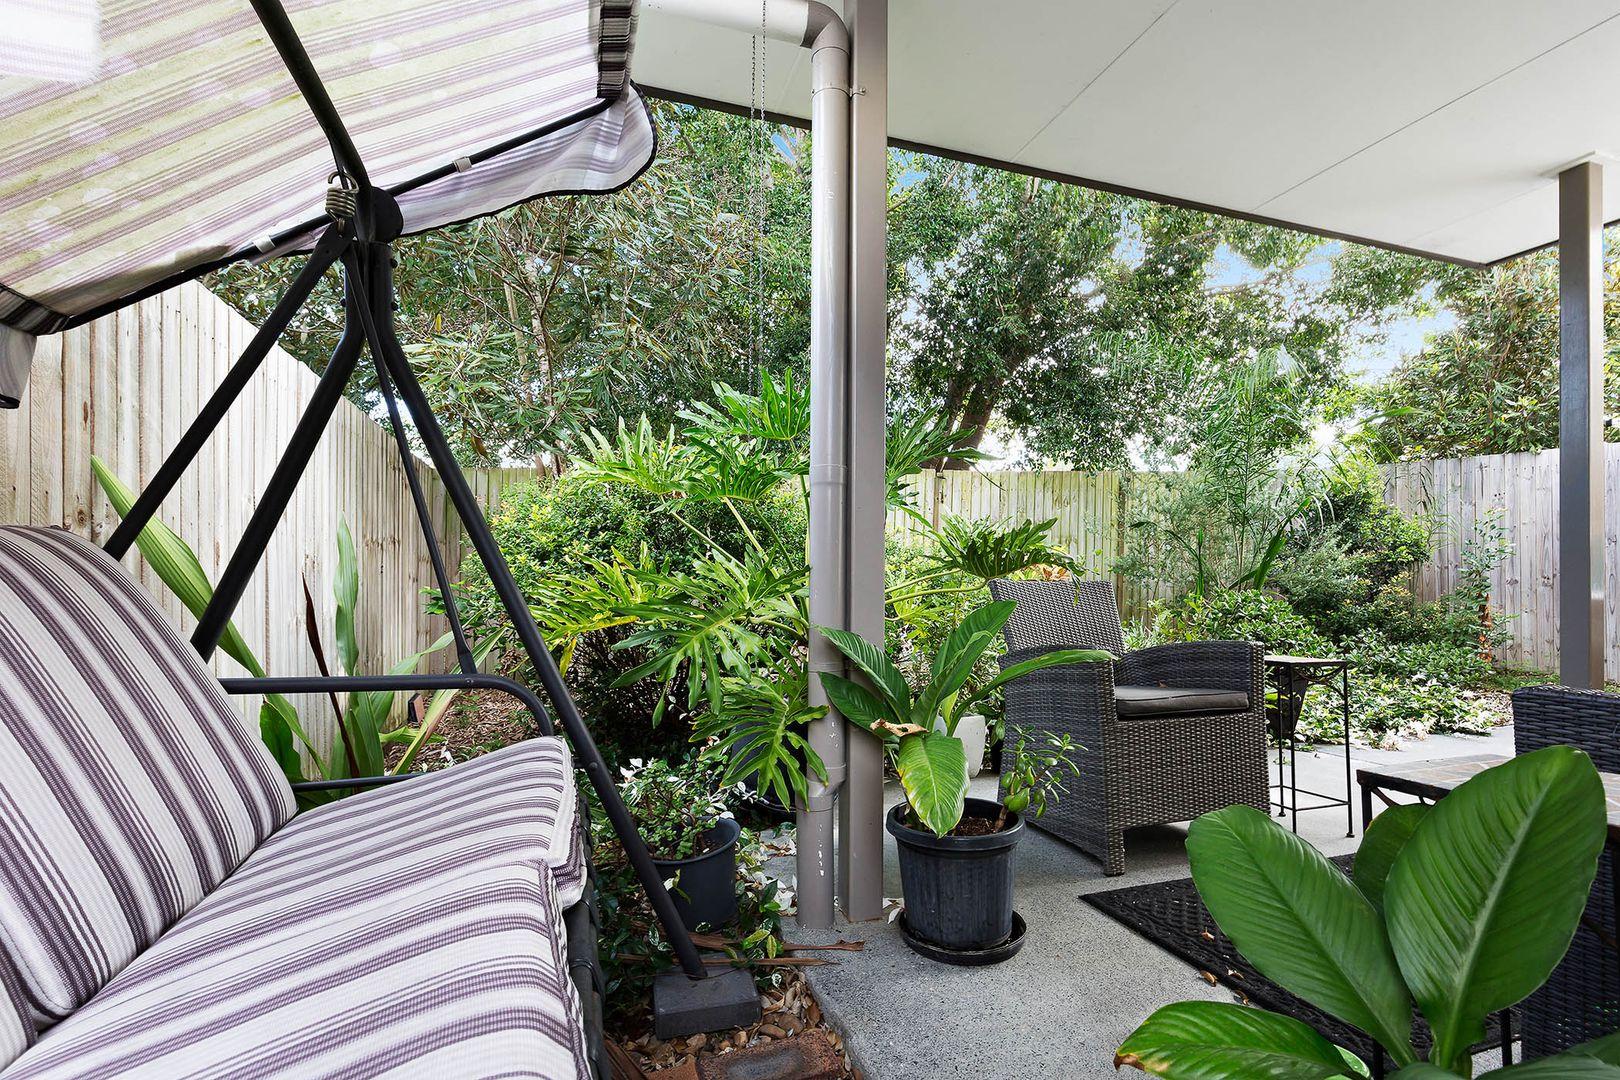 46/16 BLUEBIRD AVENUE, Ellen Grove QLD 4078, Image 0